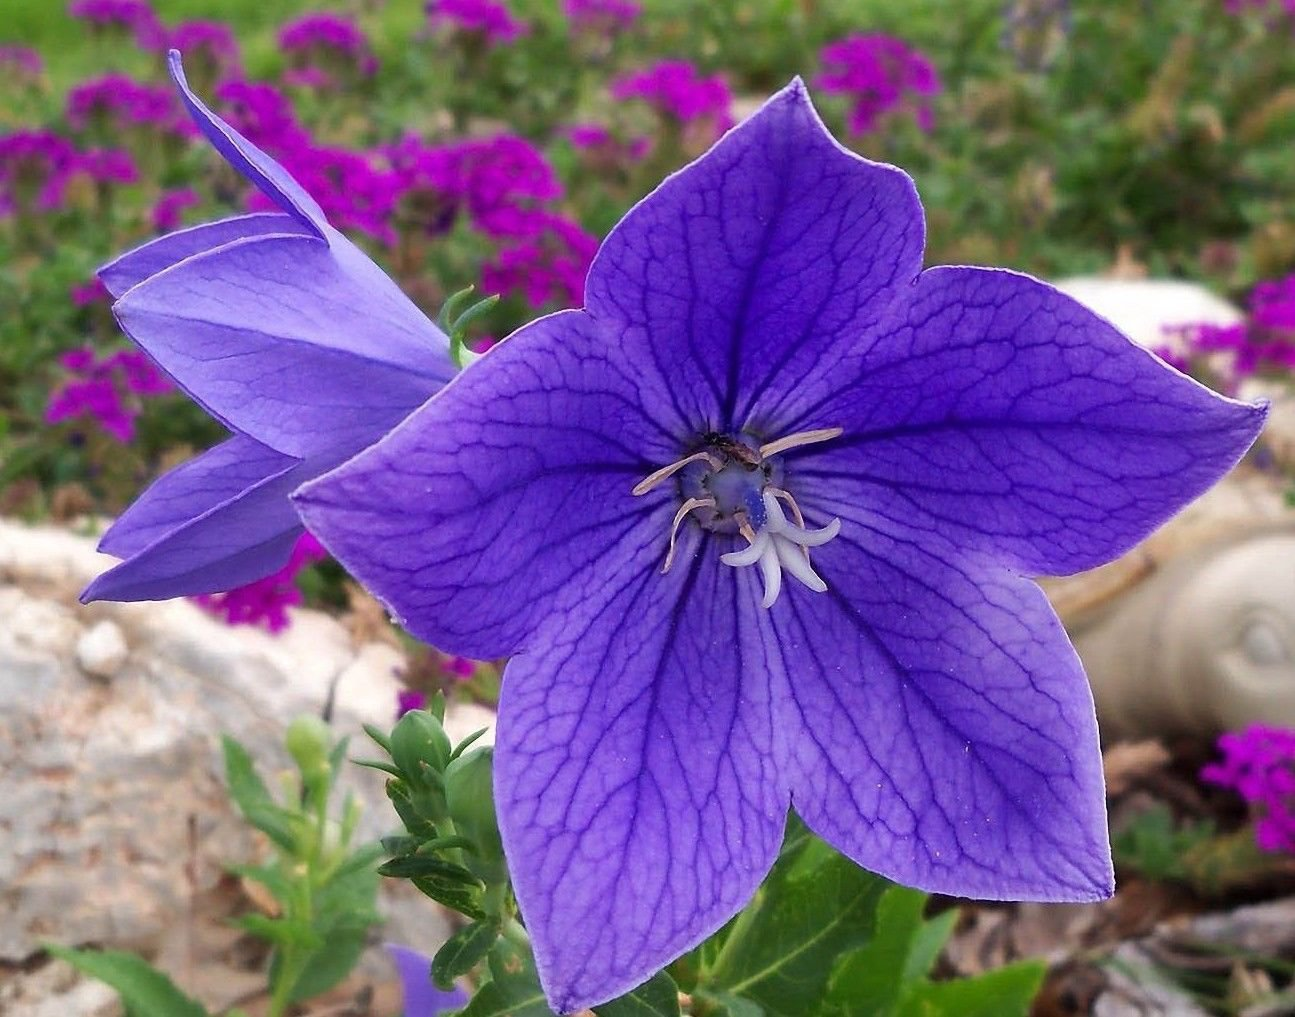 50 Blue Balloon Flower Platycodon grandiflorus Herb / Garden Flower *SHIPPING FROM US* CombSH D26